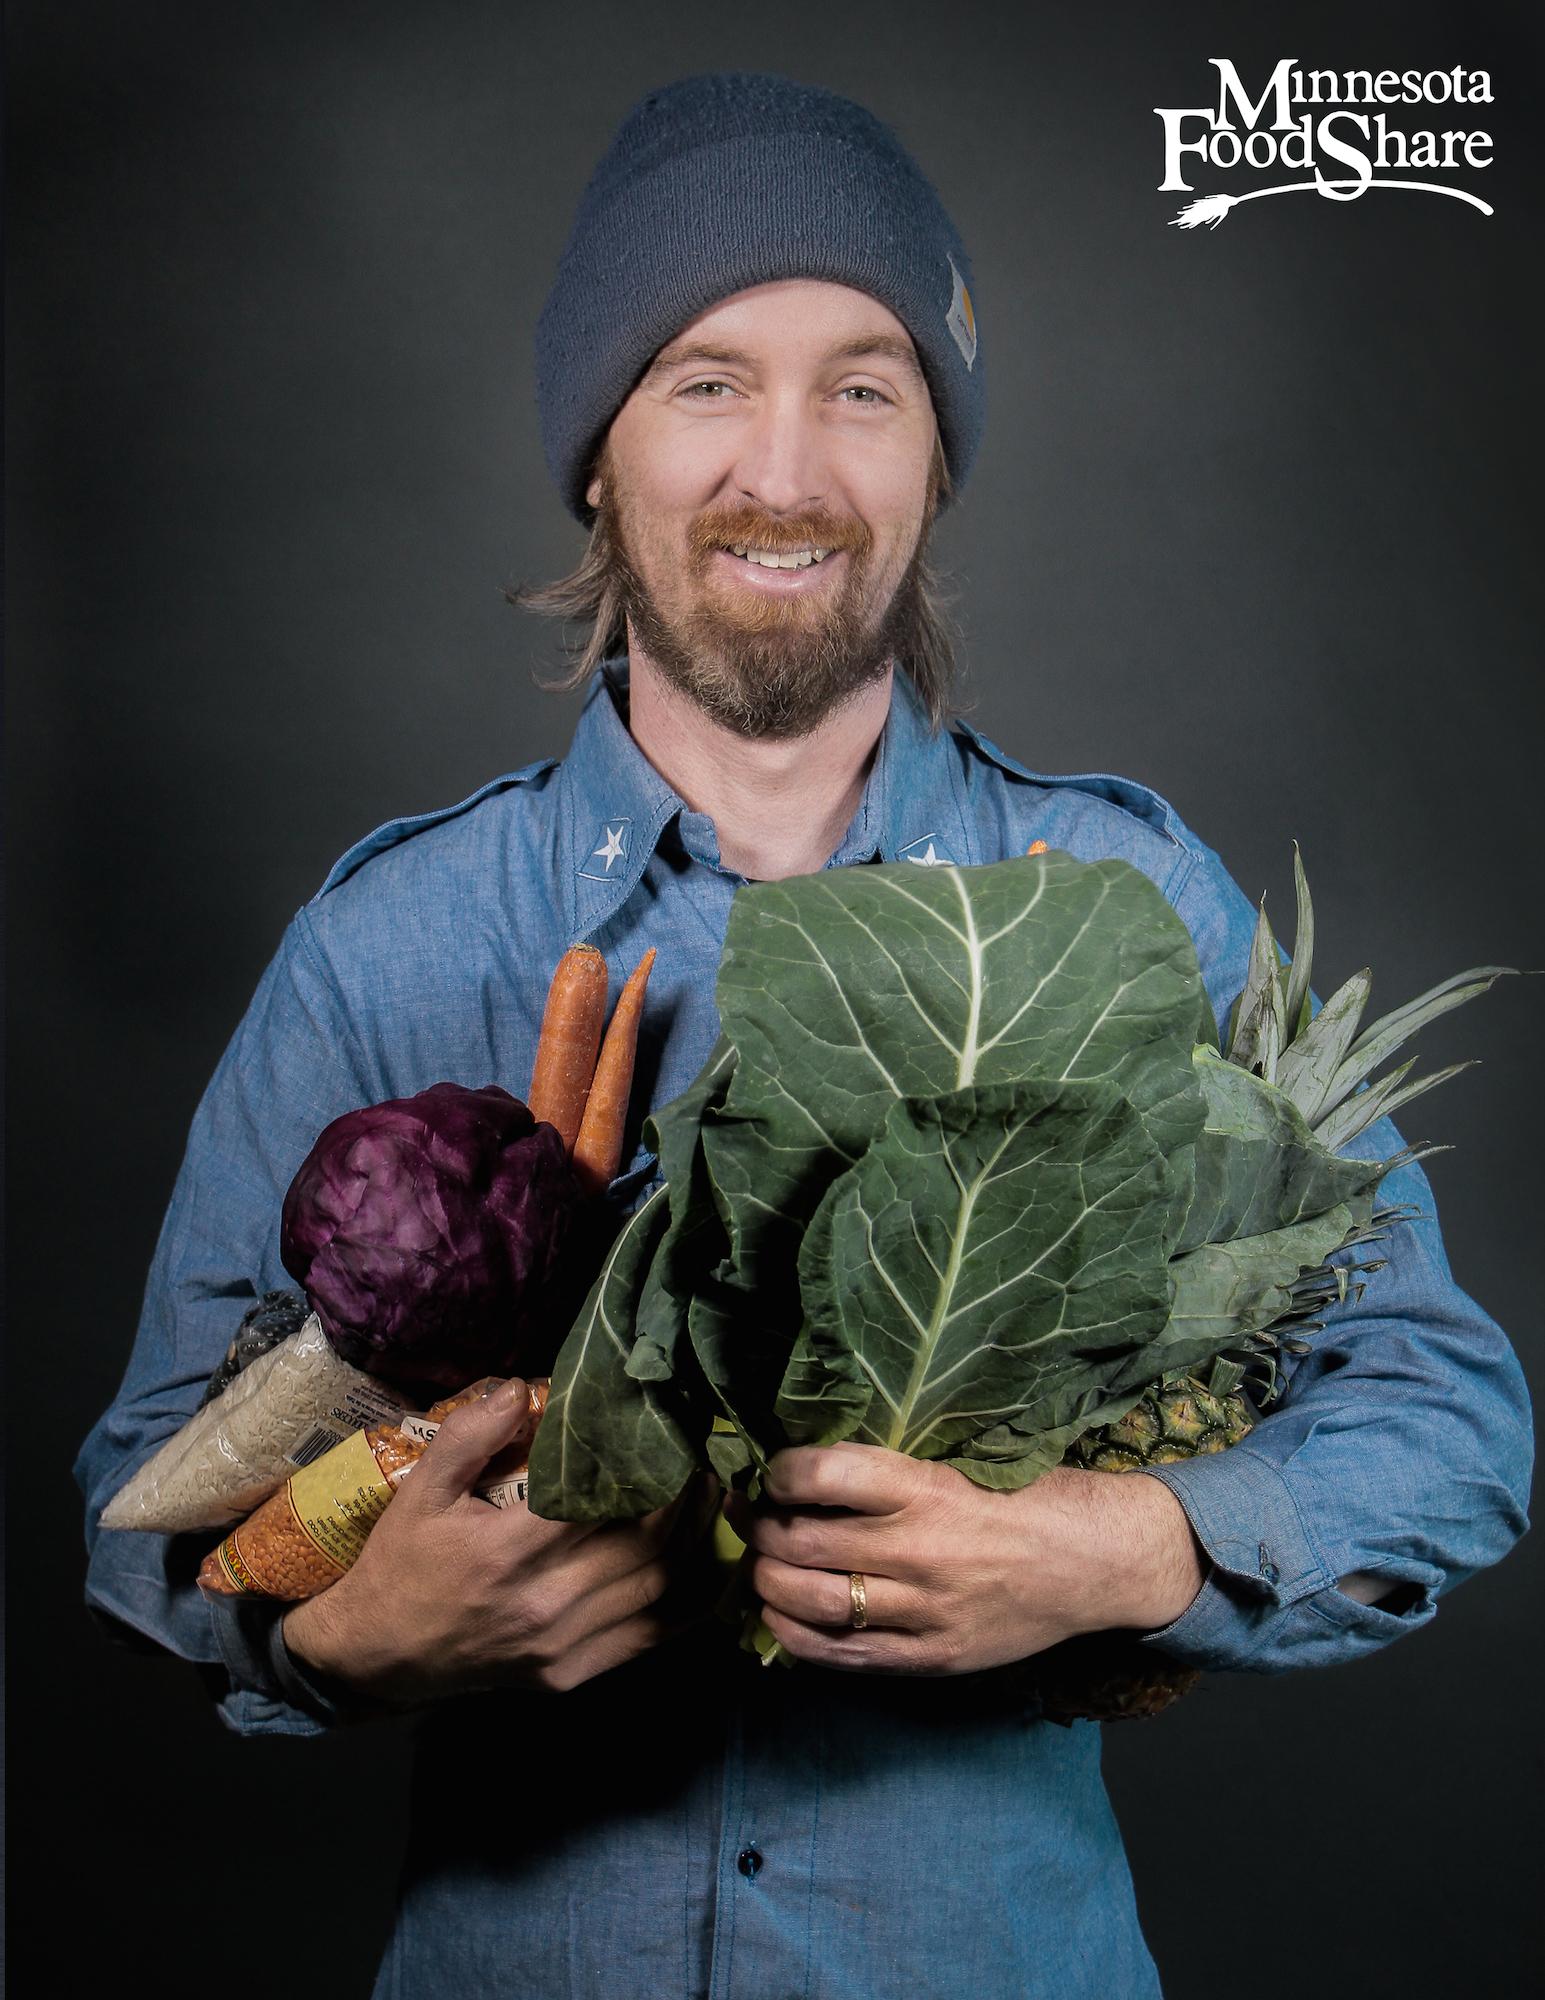 MINNESOTA FOODSHARE - Seth McGaha - Design, Website, Photography